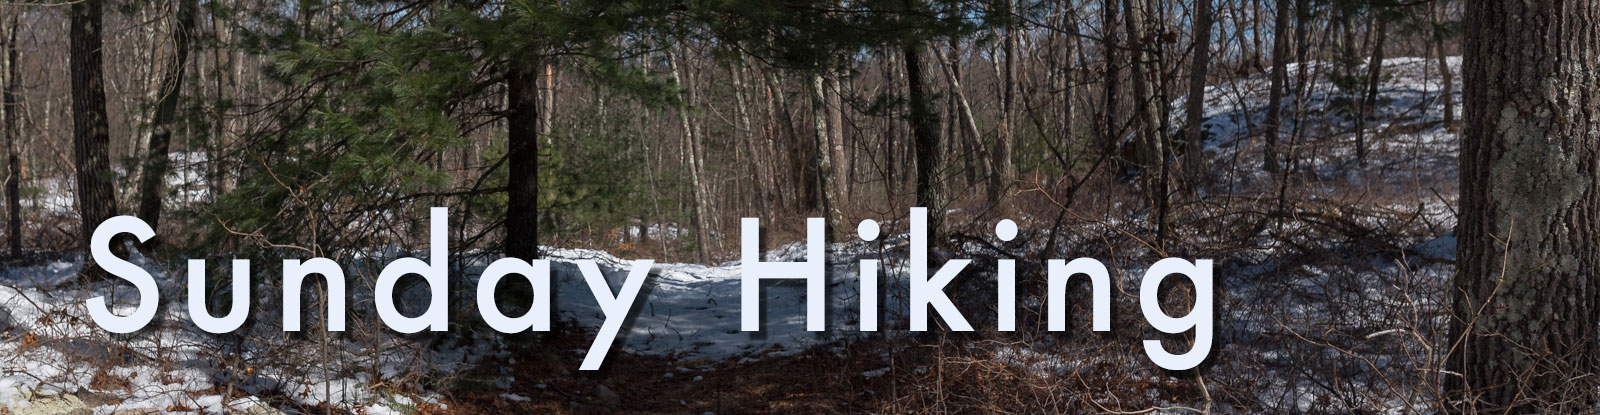 hiking-header.jpg